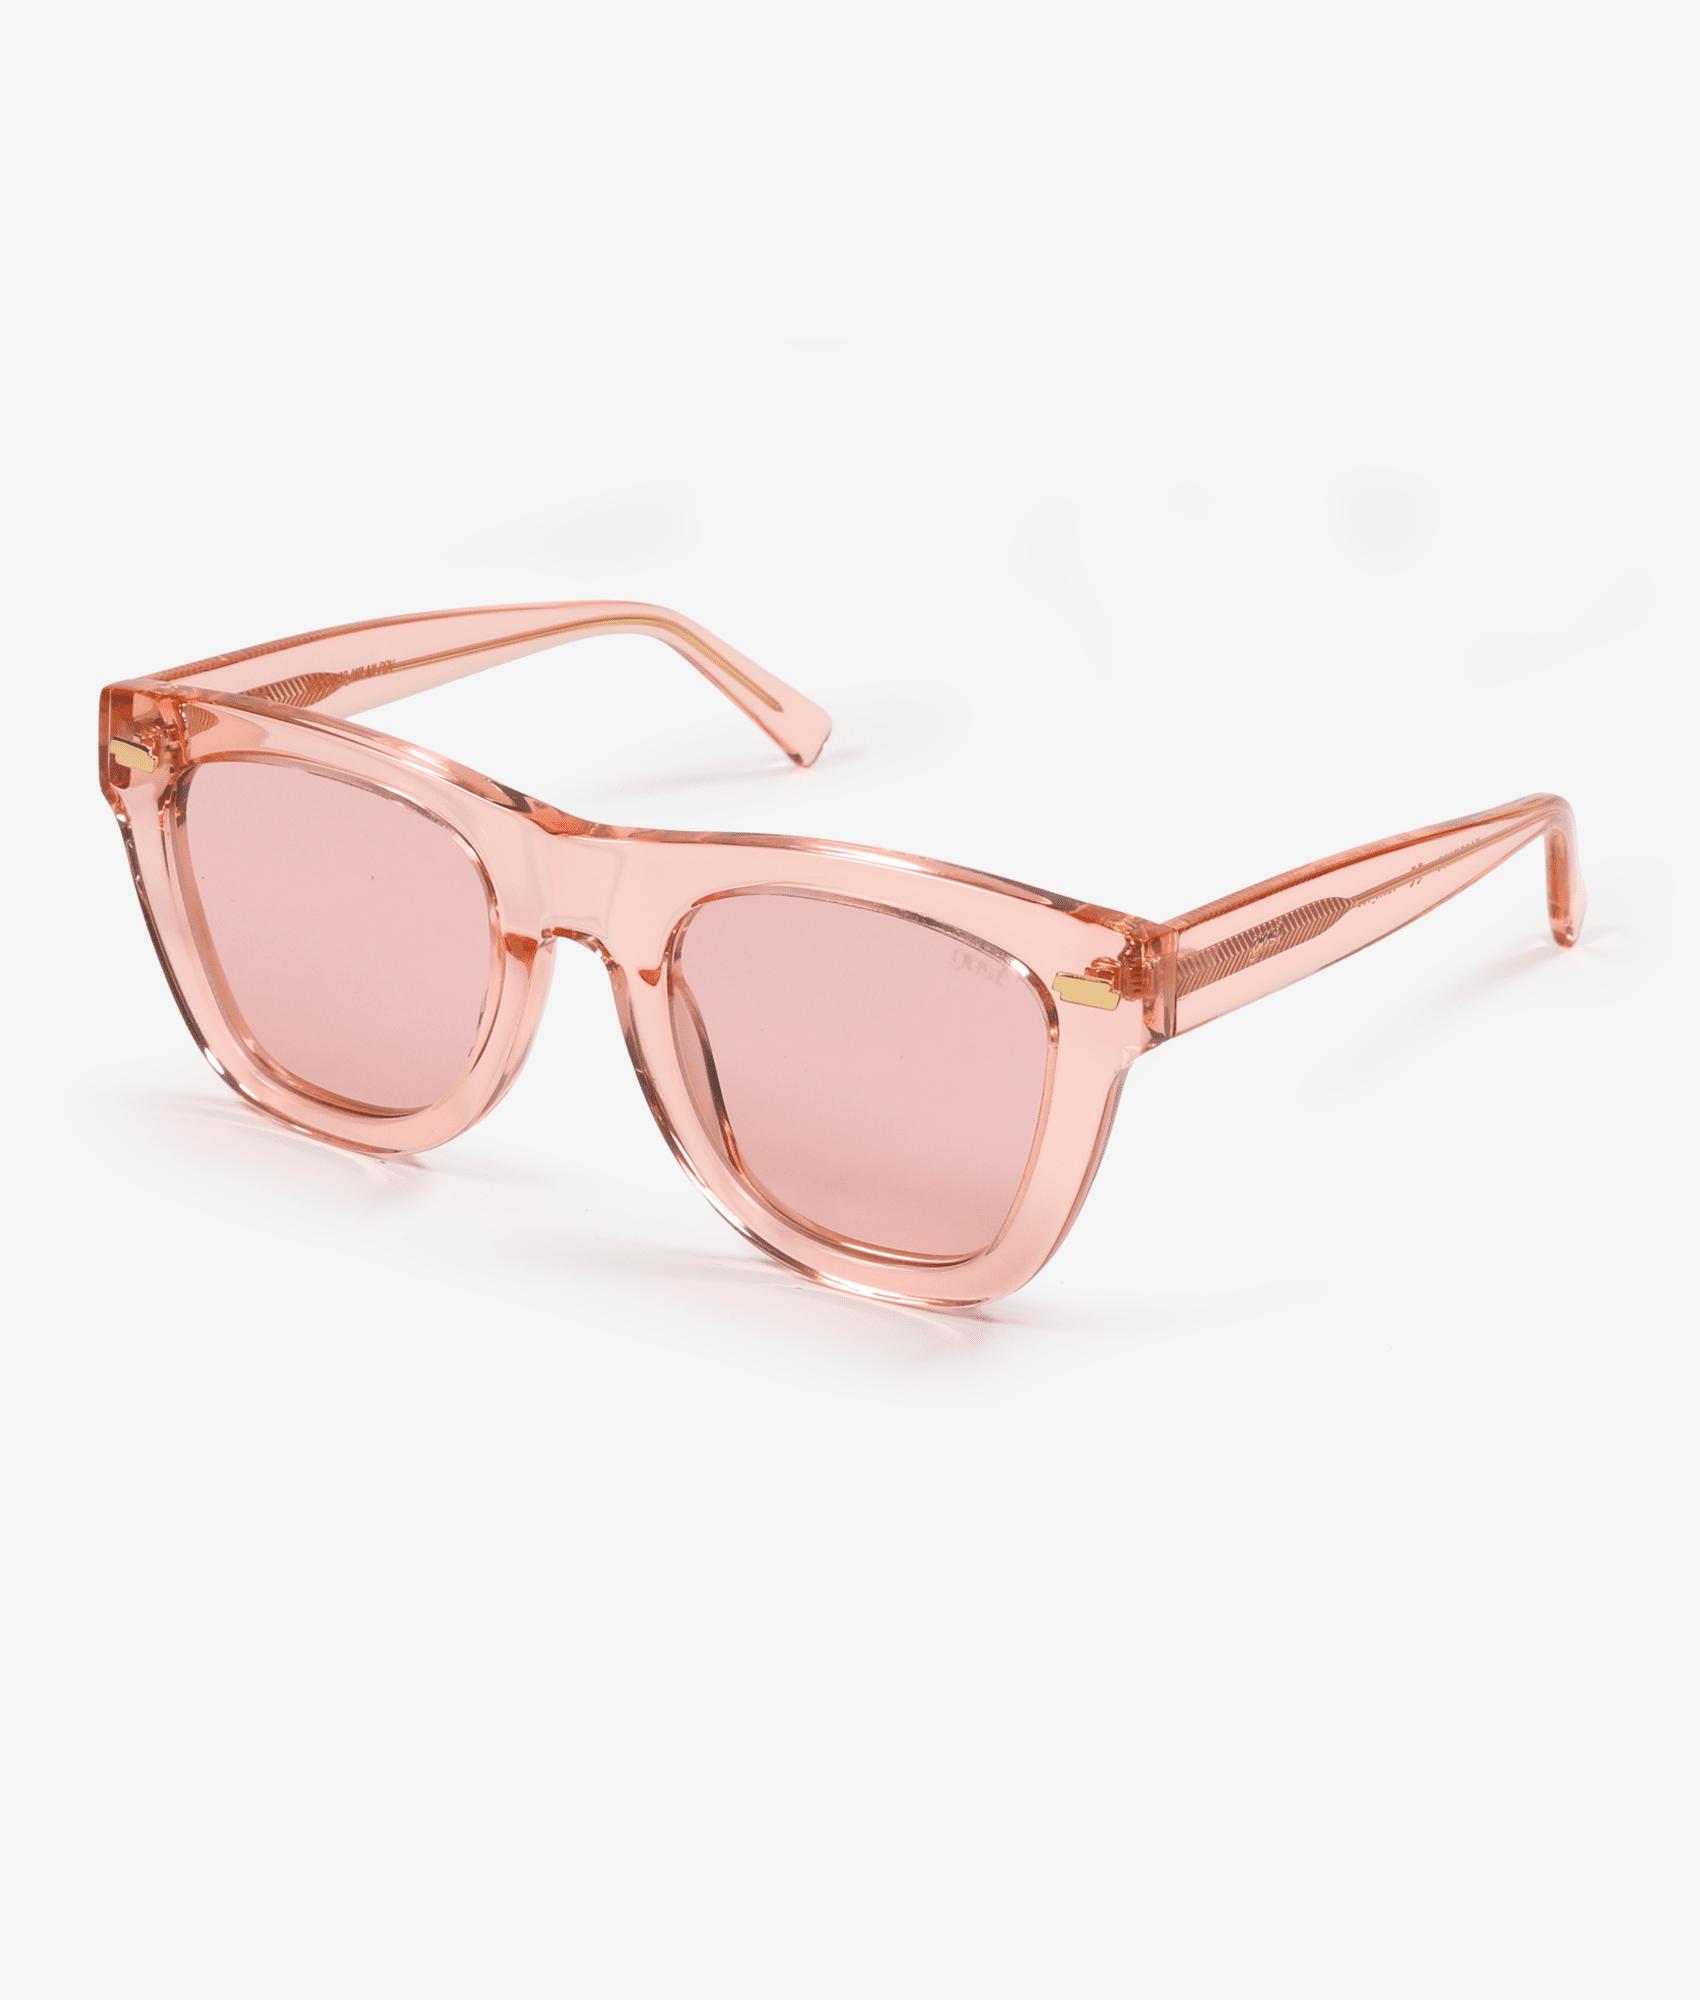 VENTI 100 Gast Sunglasses